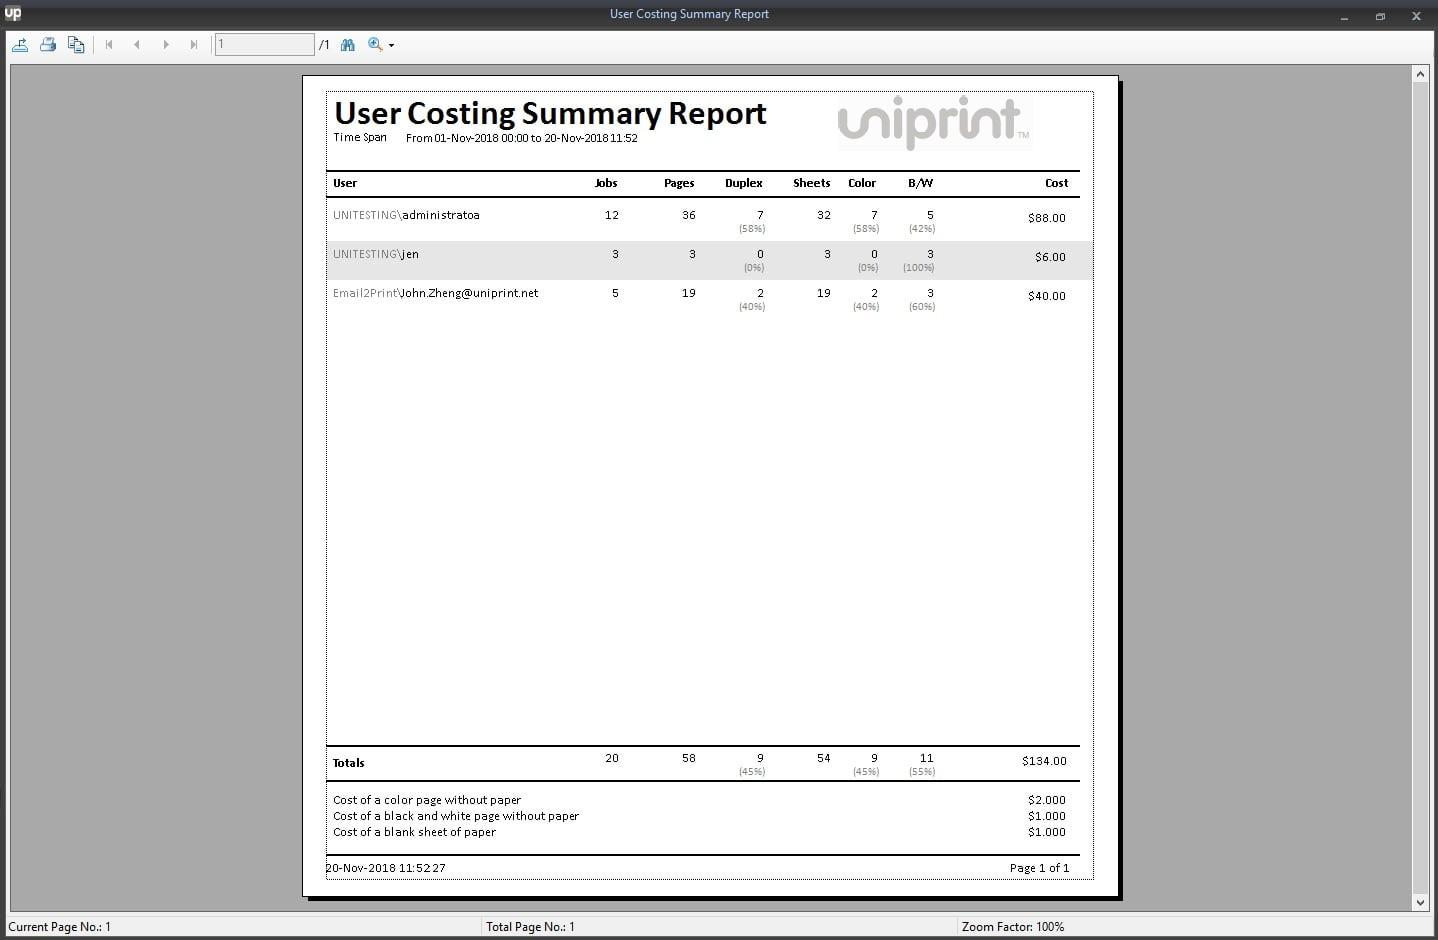 UP Print tracker tool - Print Statistics User Cost Summary Report